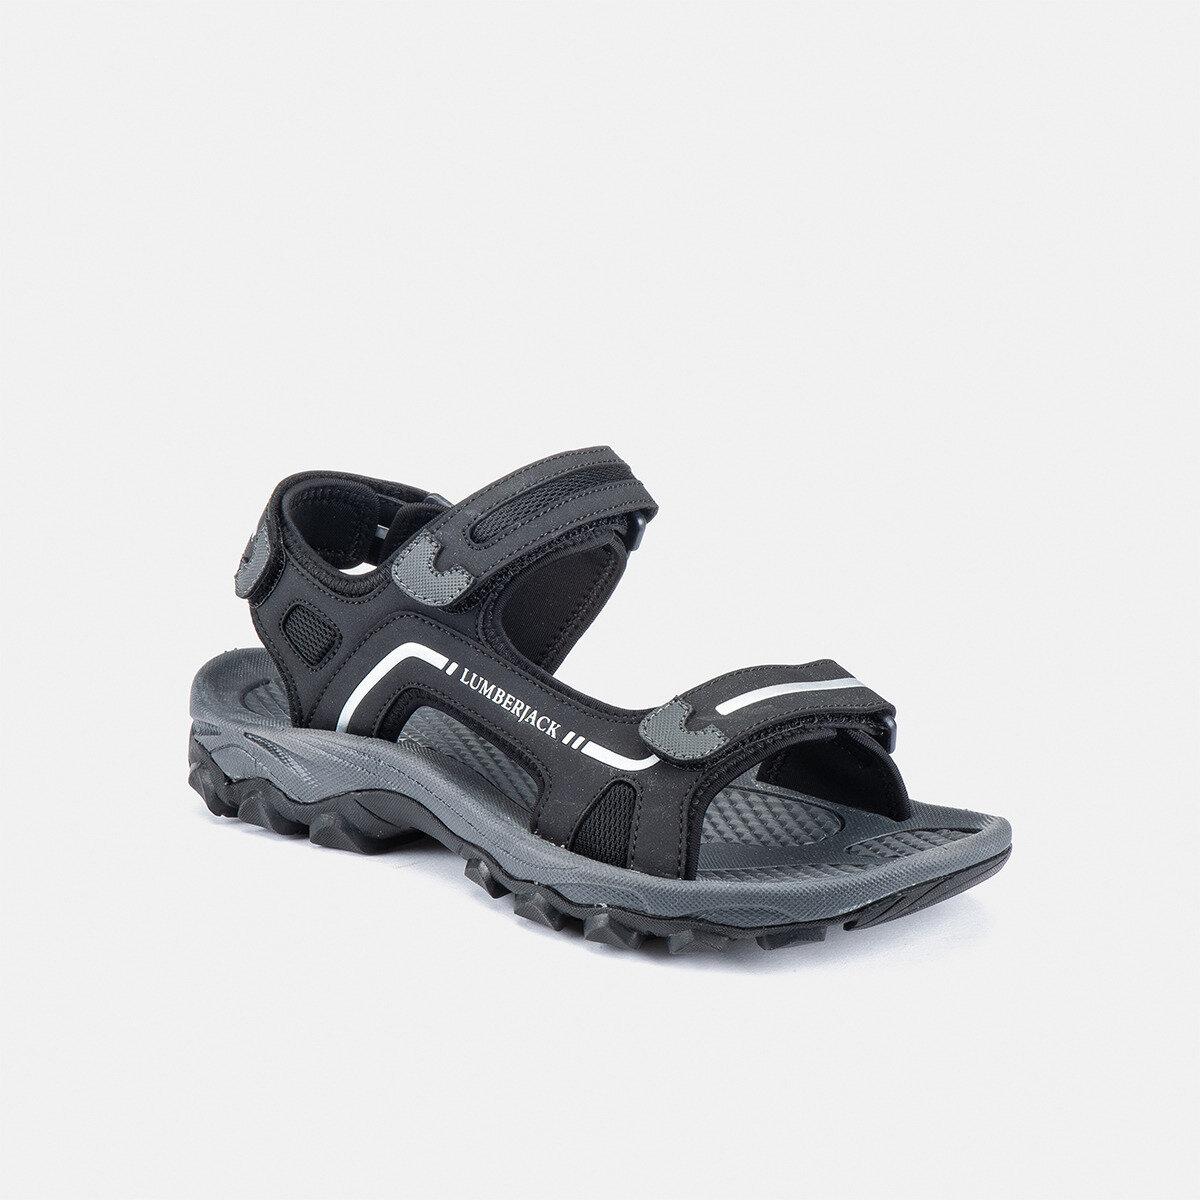 LAGGUN BLACK Man Sandals